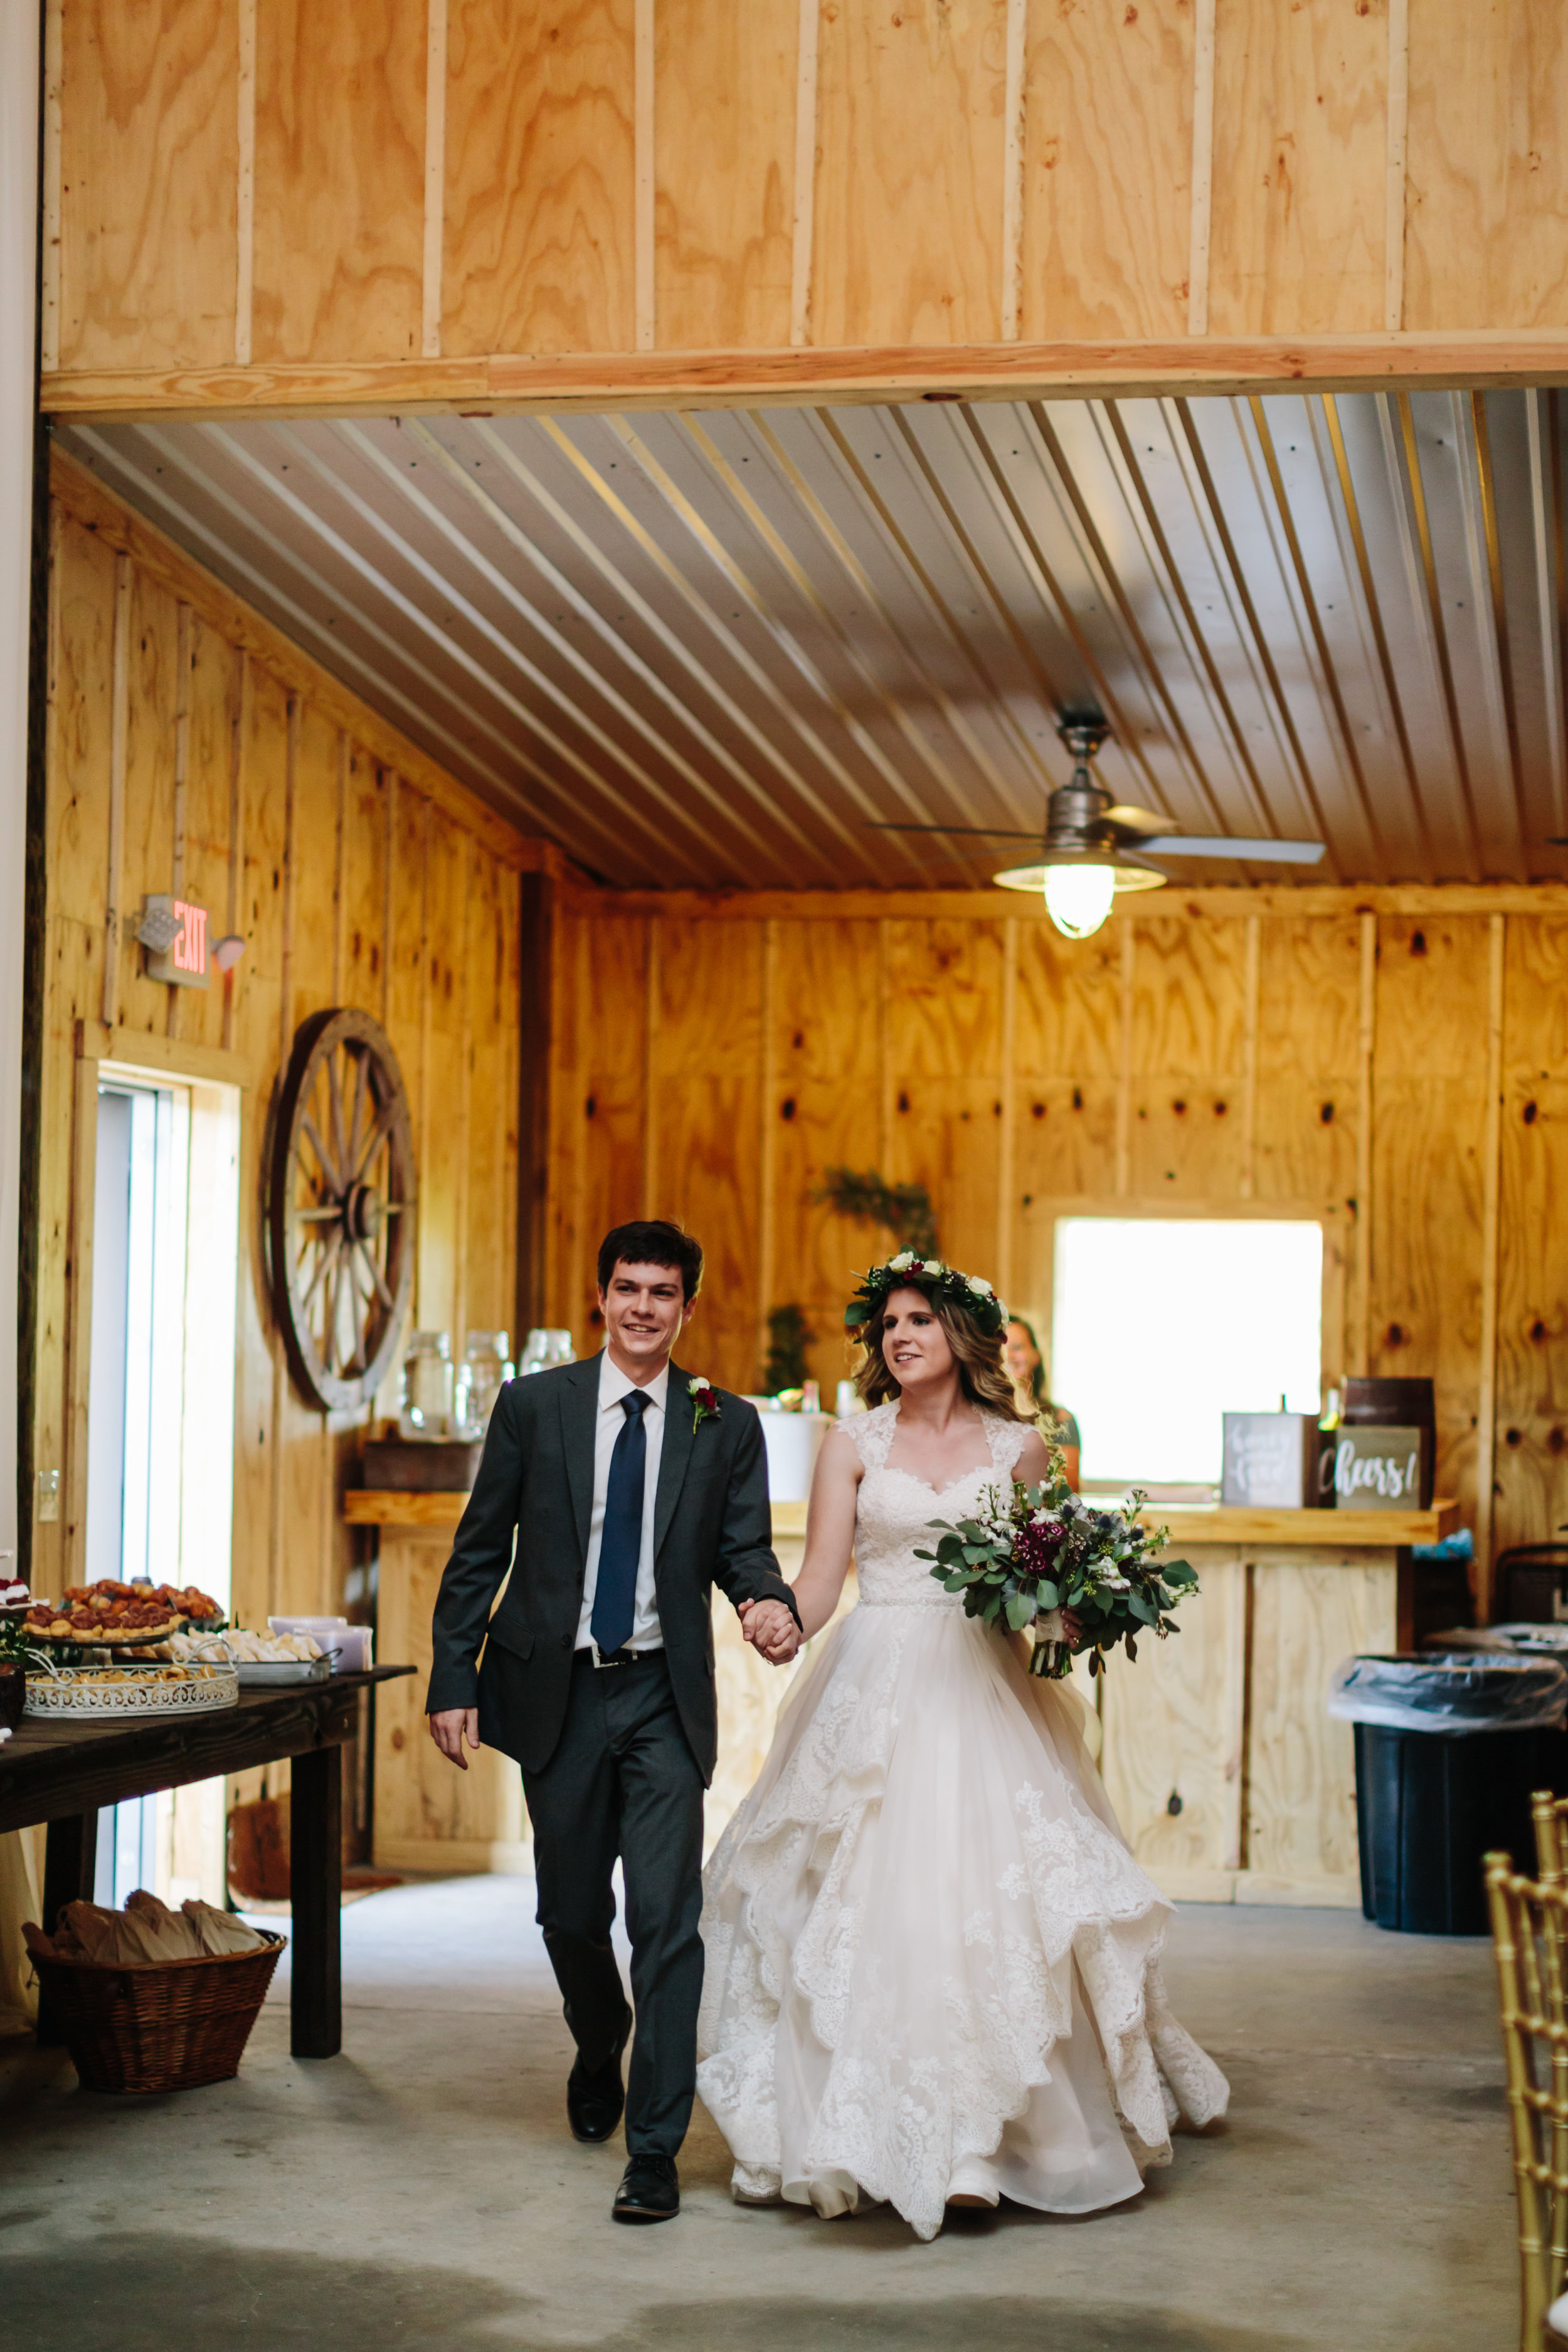 2018.04.14 Zak and Jamisyn Unrue Black Willow Barn Wedding Finals-617.jpg